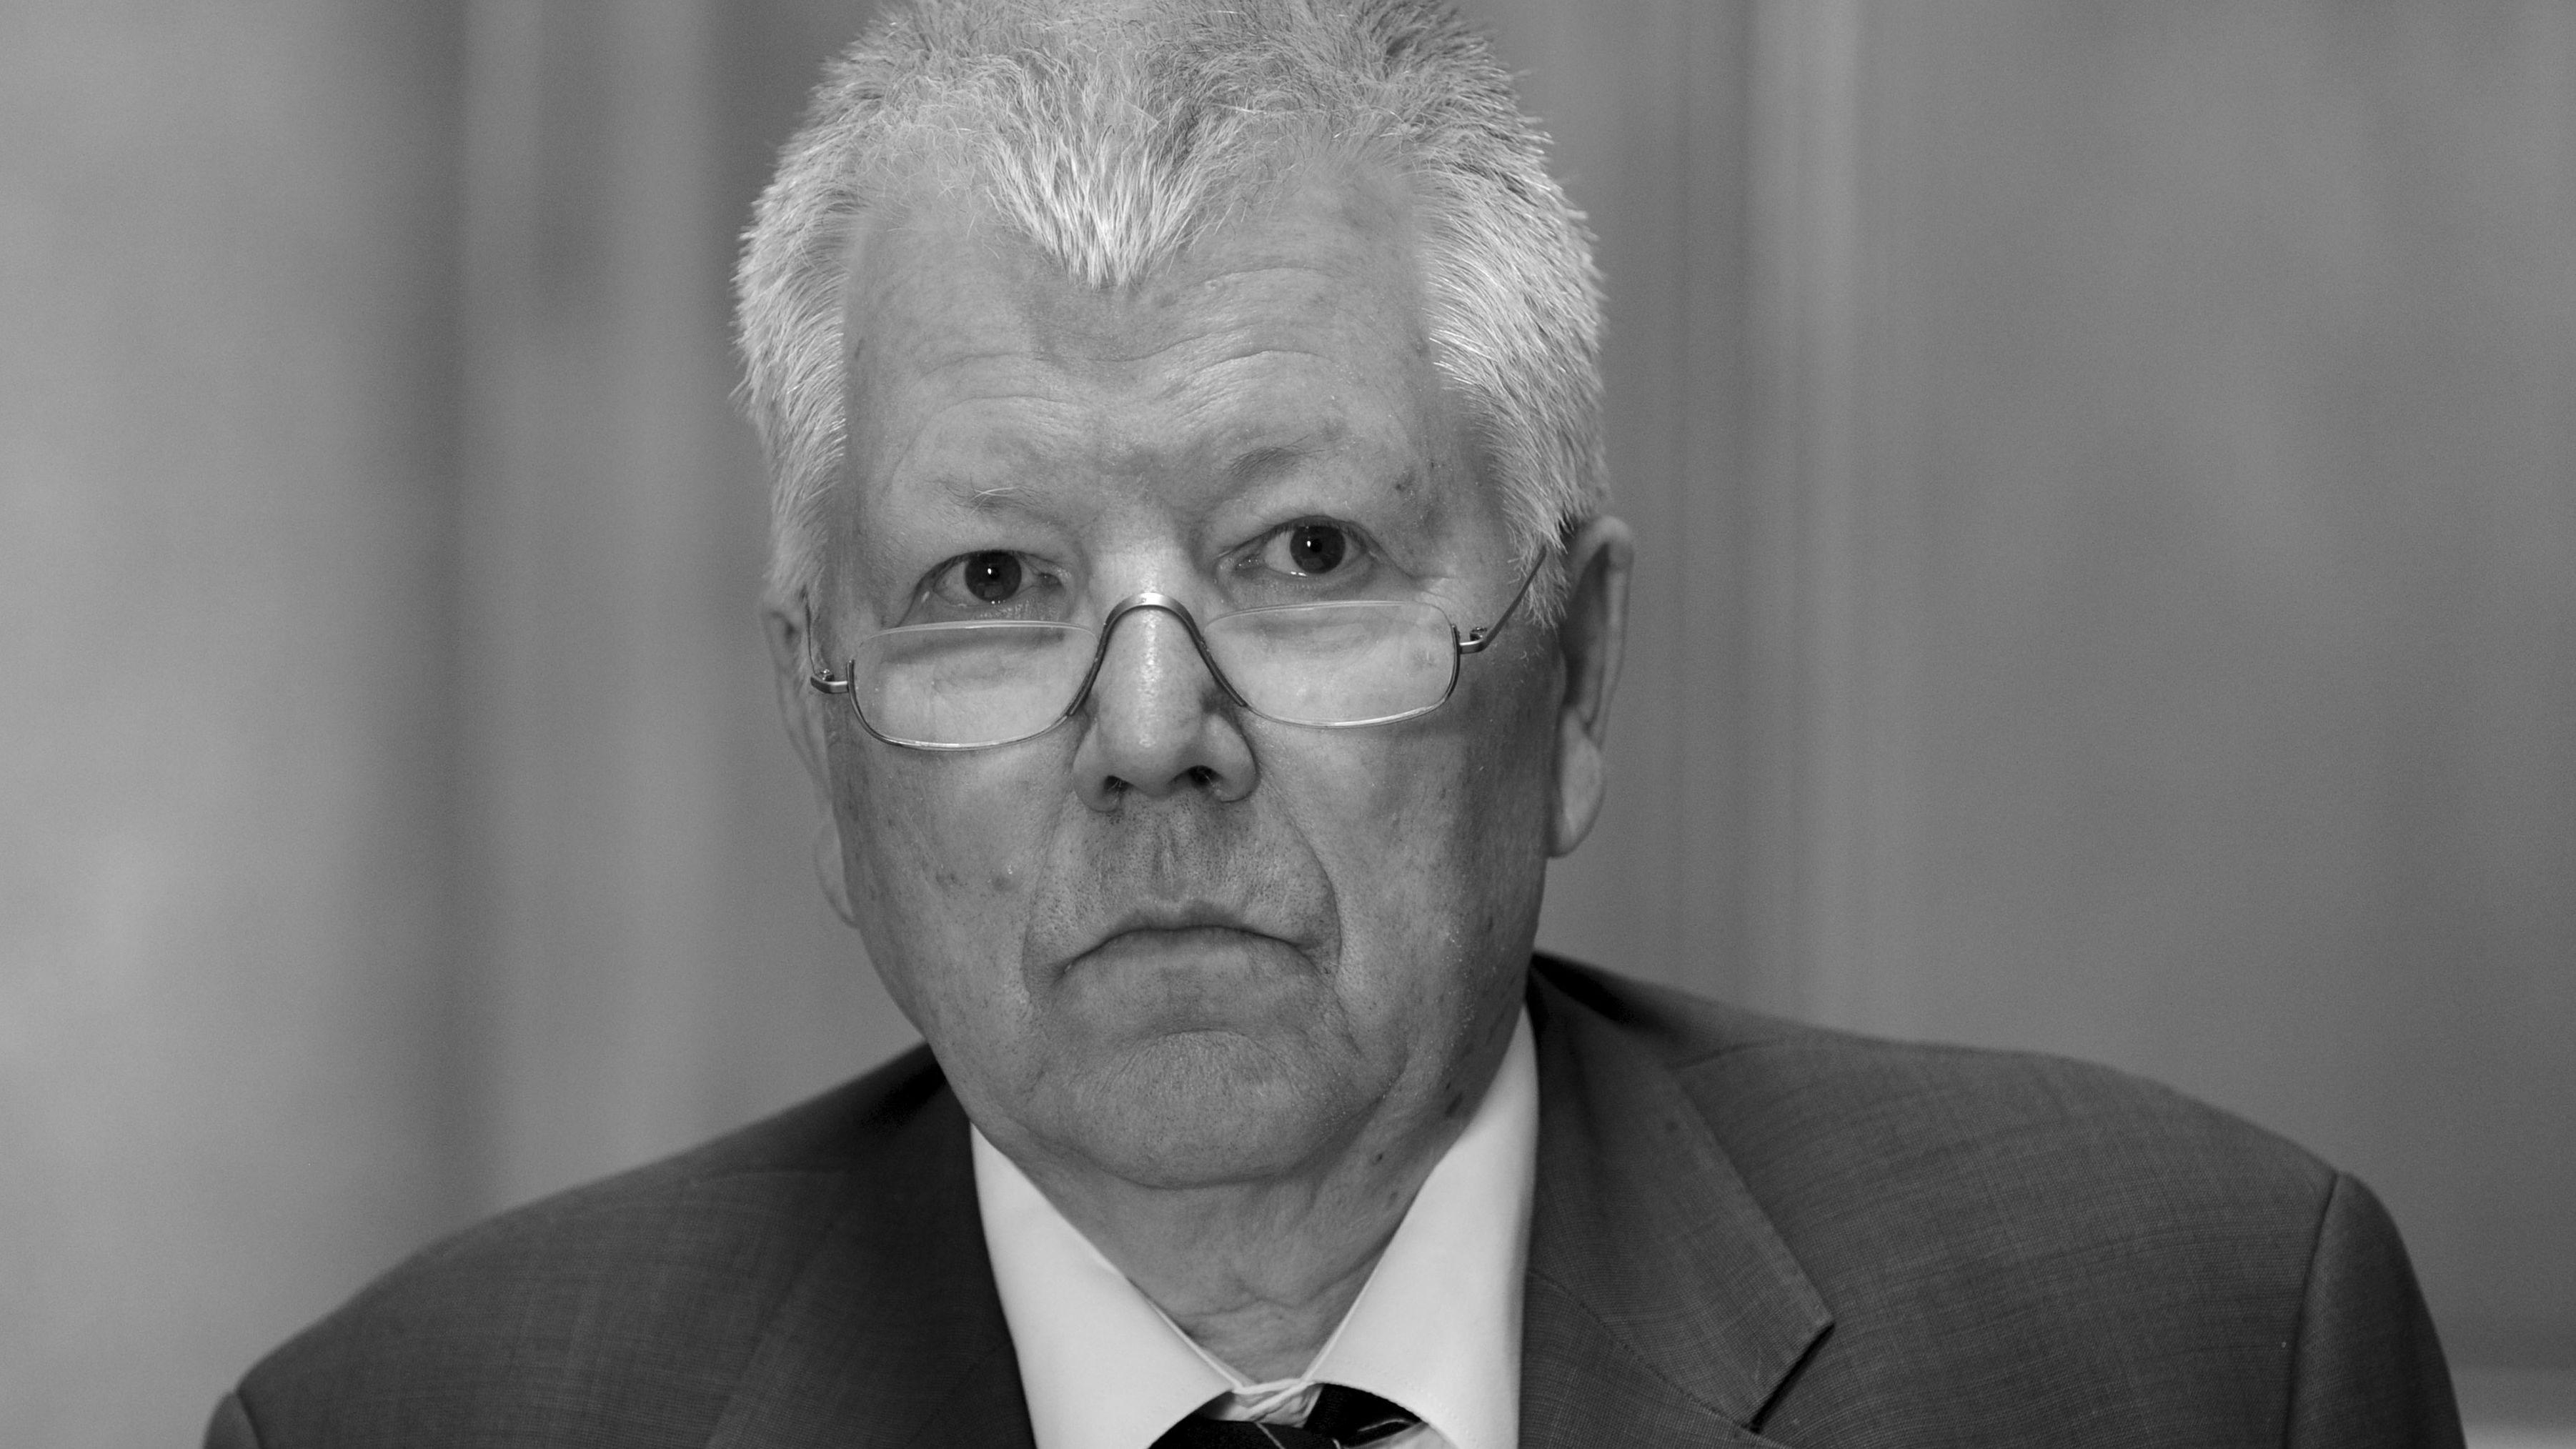 Michael Petzet